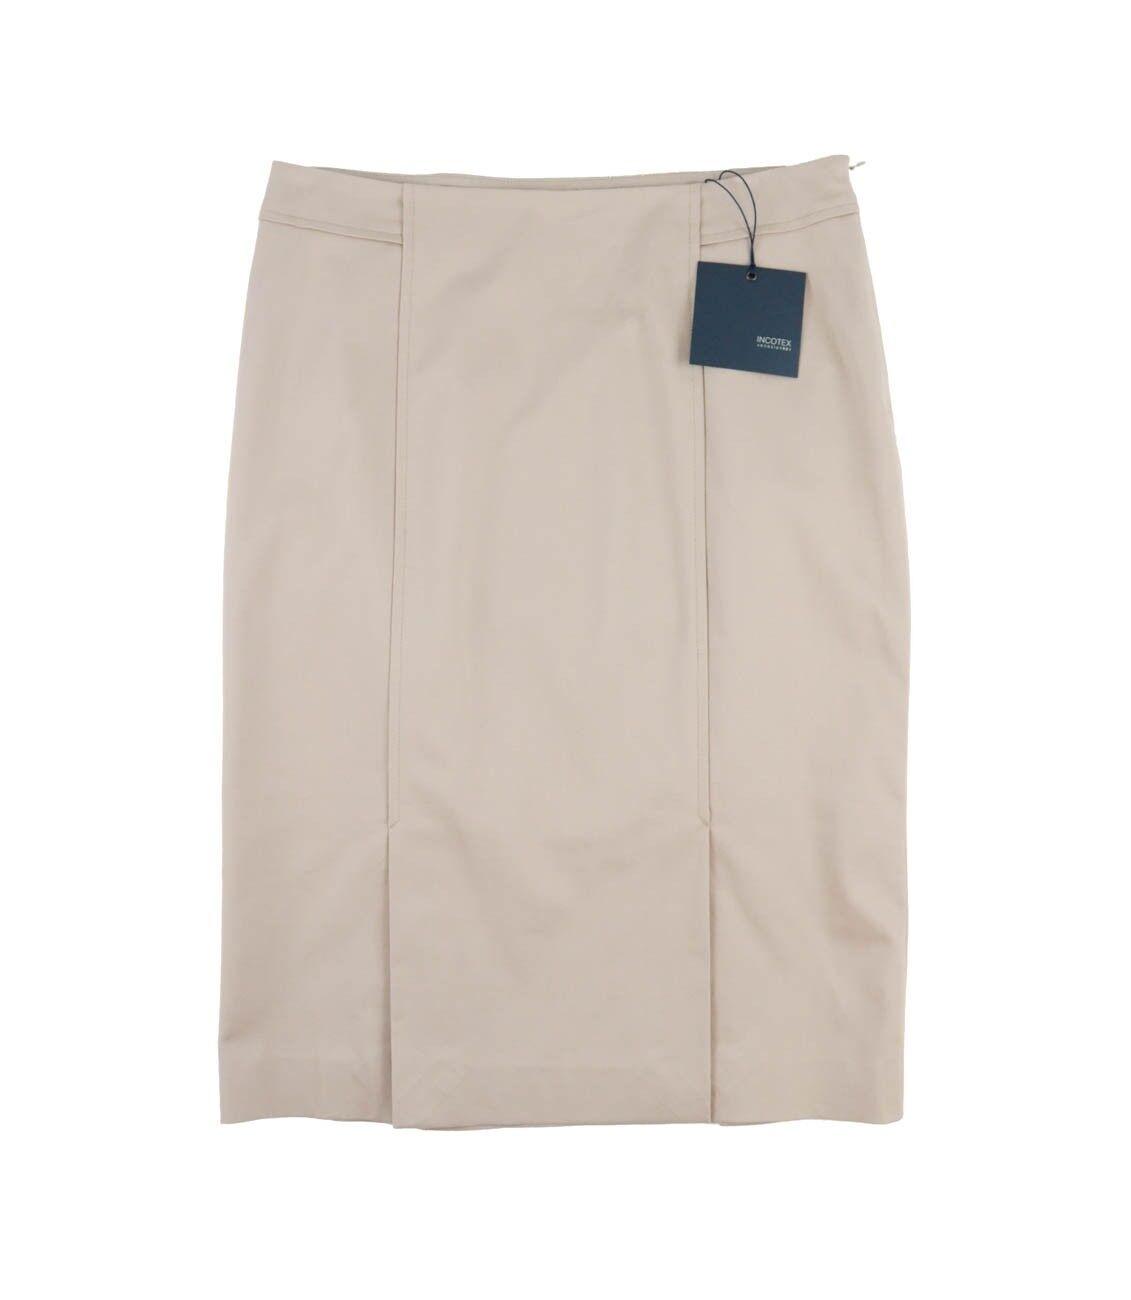 NWT Women's INCOTEX Venezia Solid Tan Cotton Dress Pencil Skirt EU42 US12